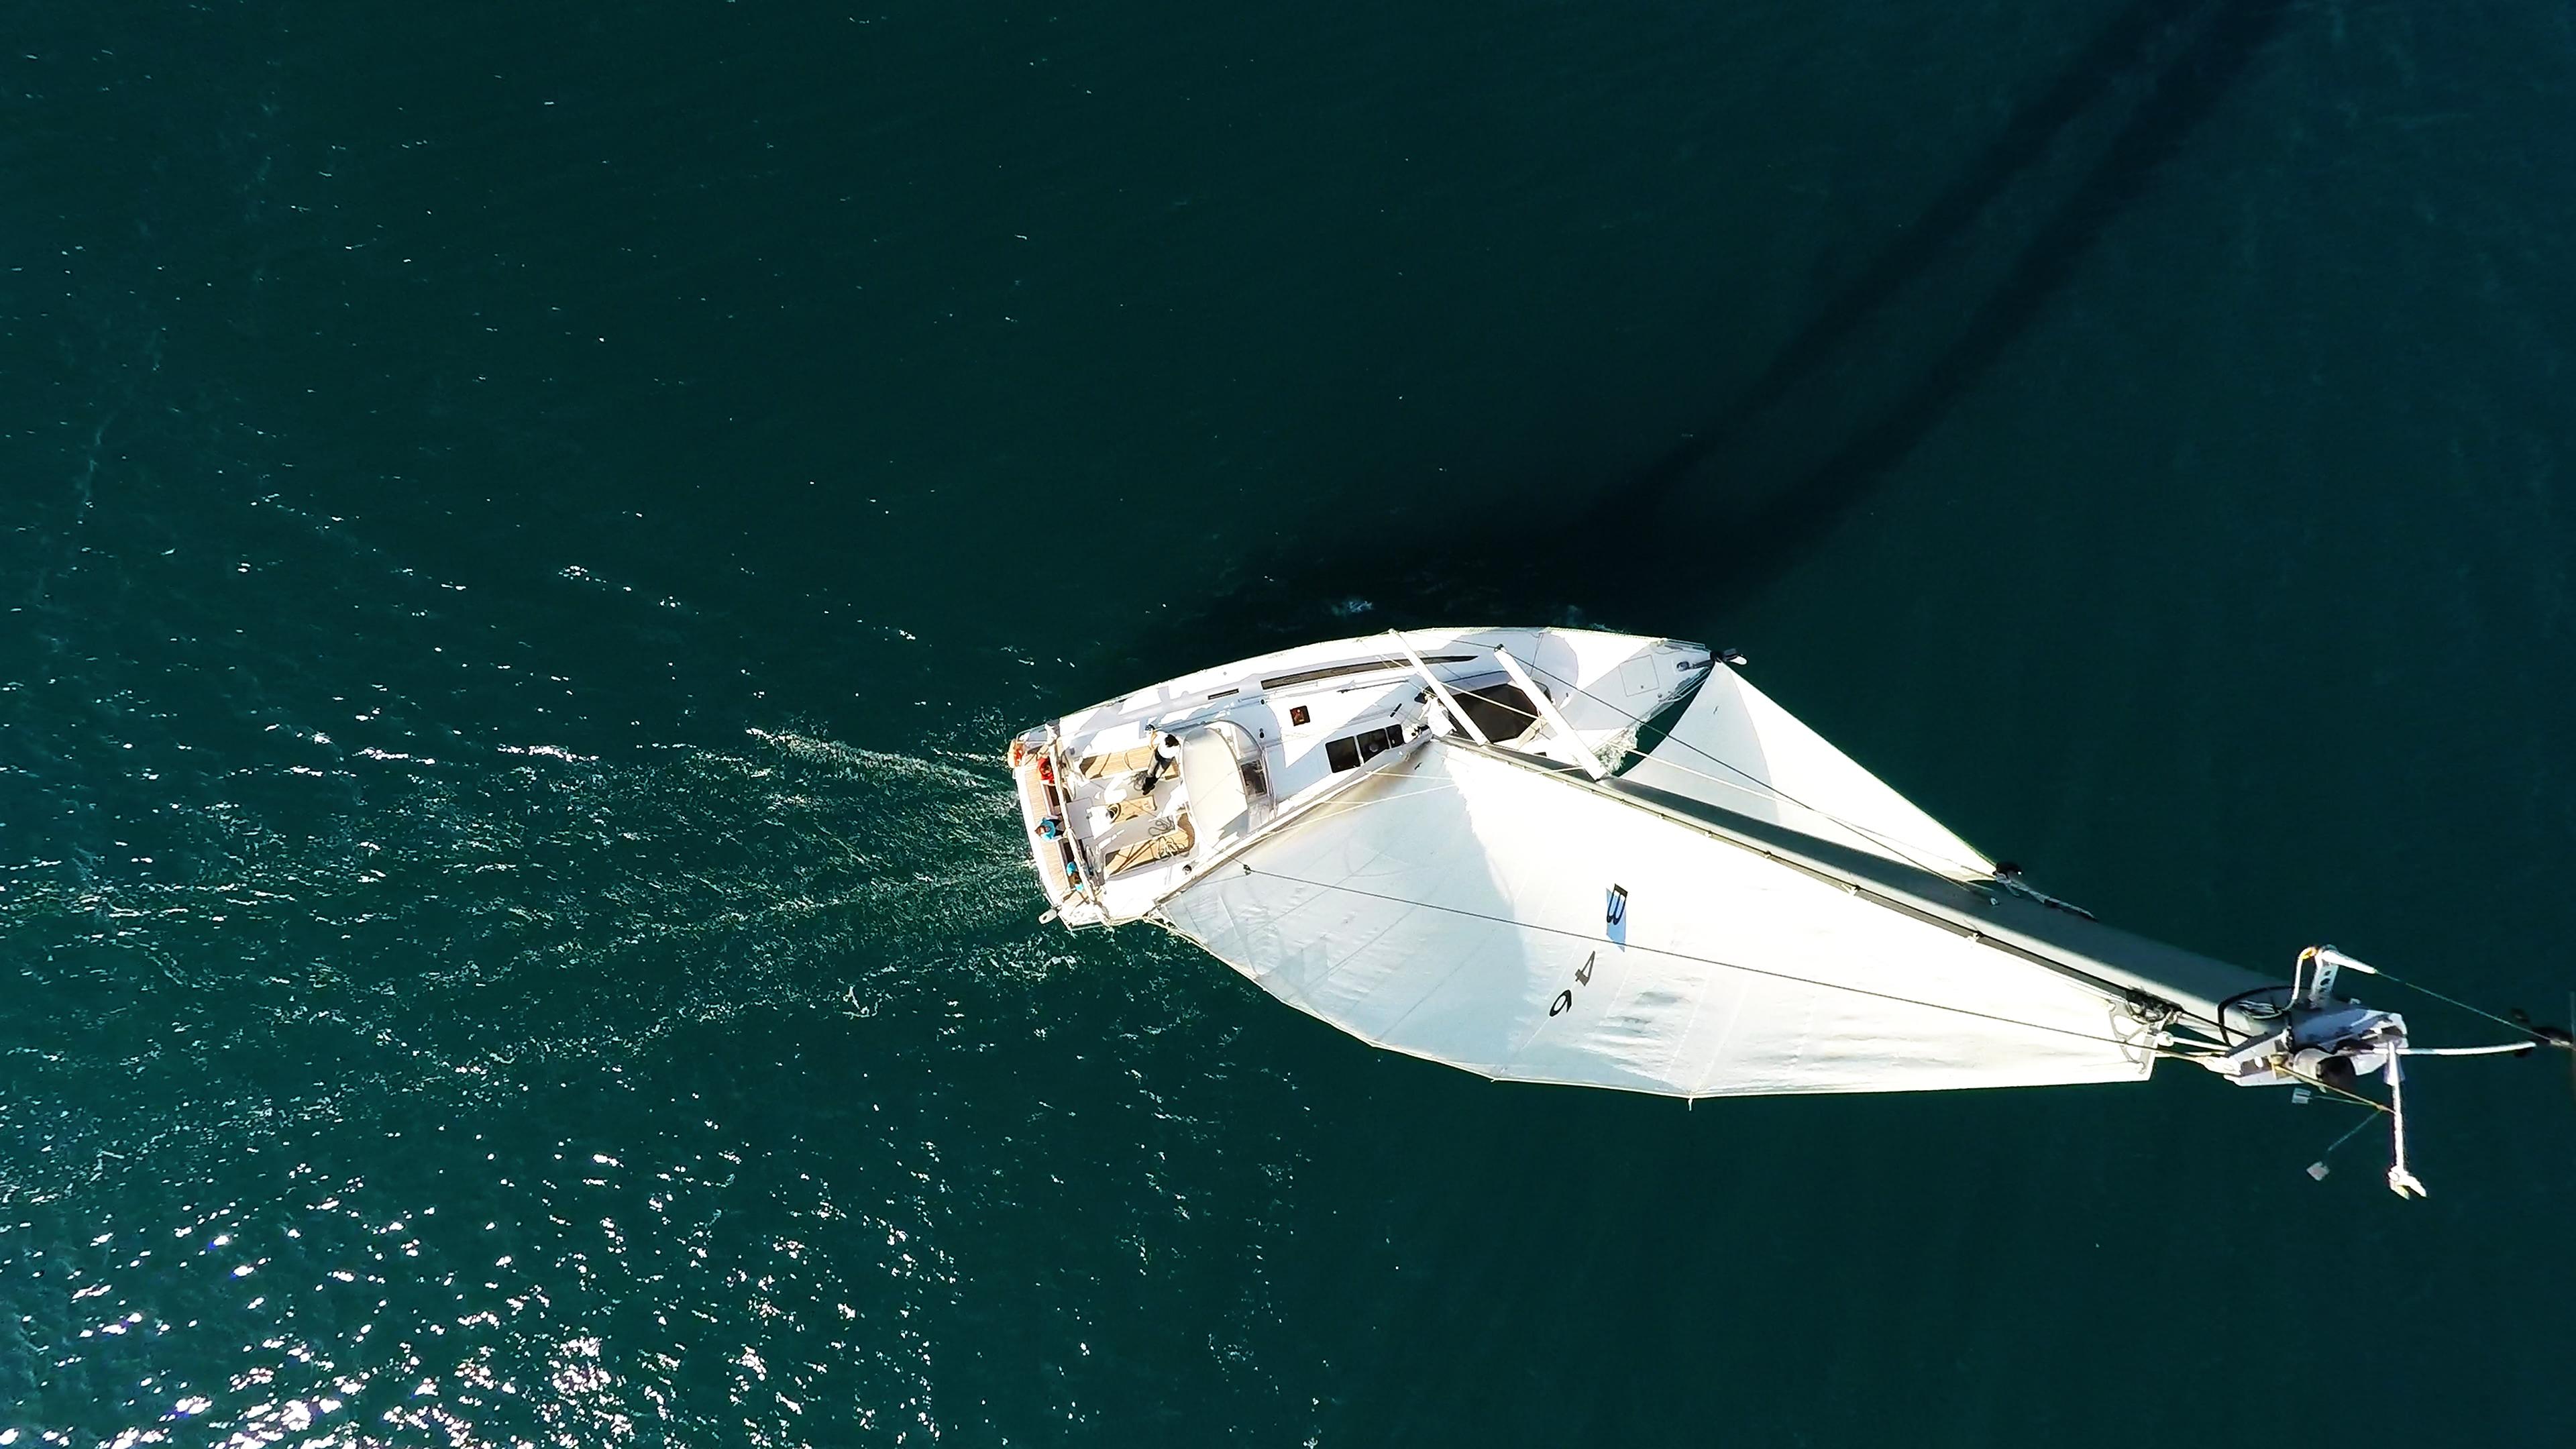 barcha a vela bavaria 46 yacht veleggiare barca a vela albero